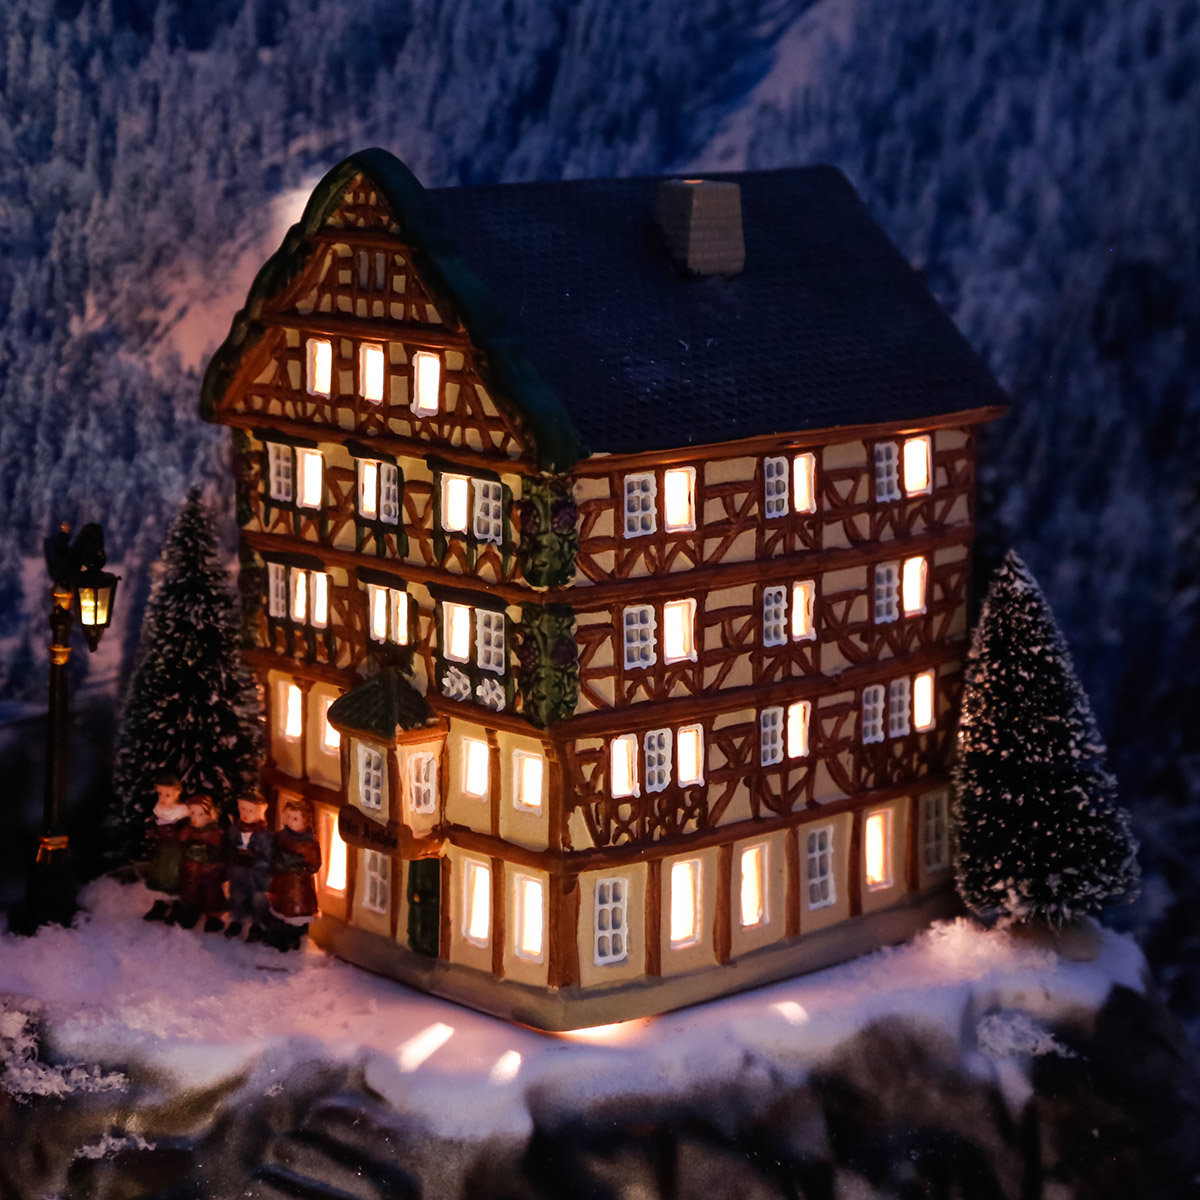 Miniatur-Lichthaus Adler-Apotheke in Bernkastel-Kues | #2